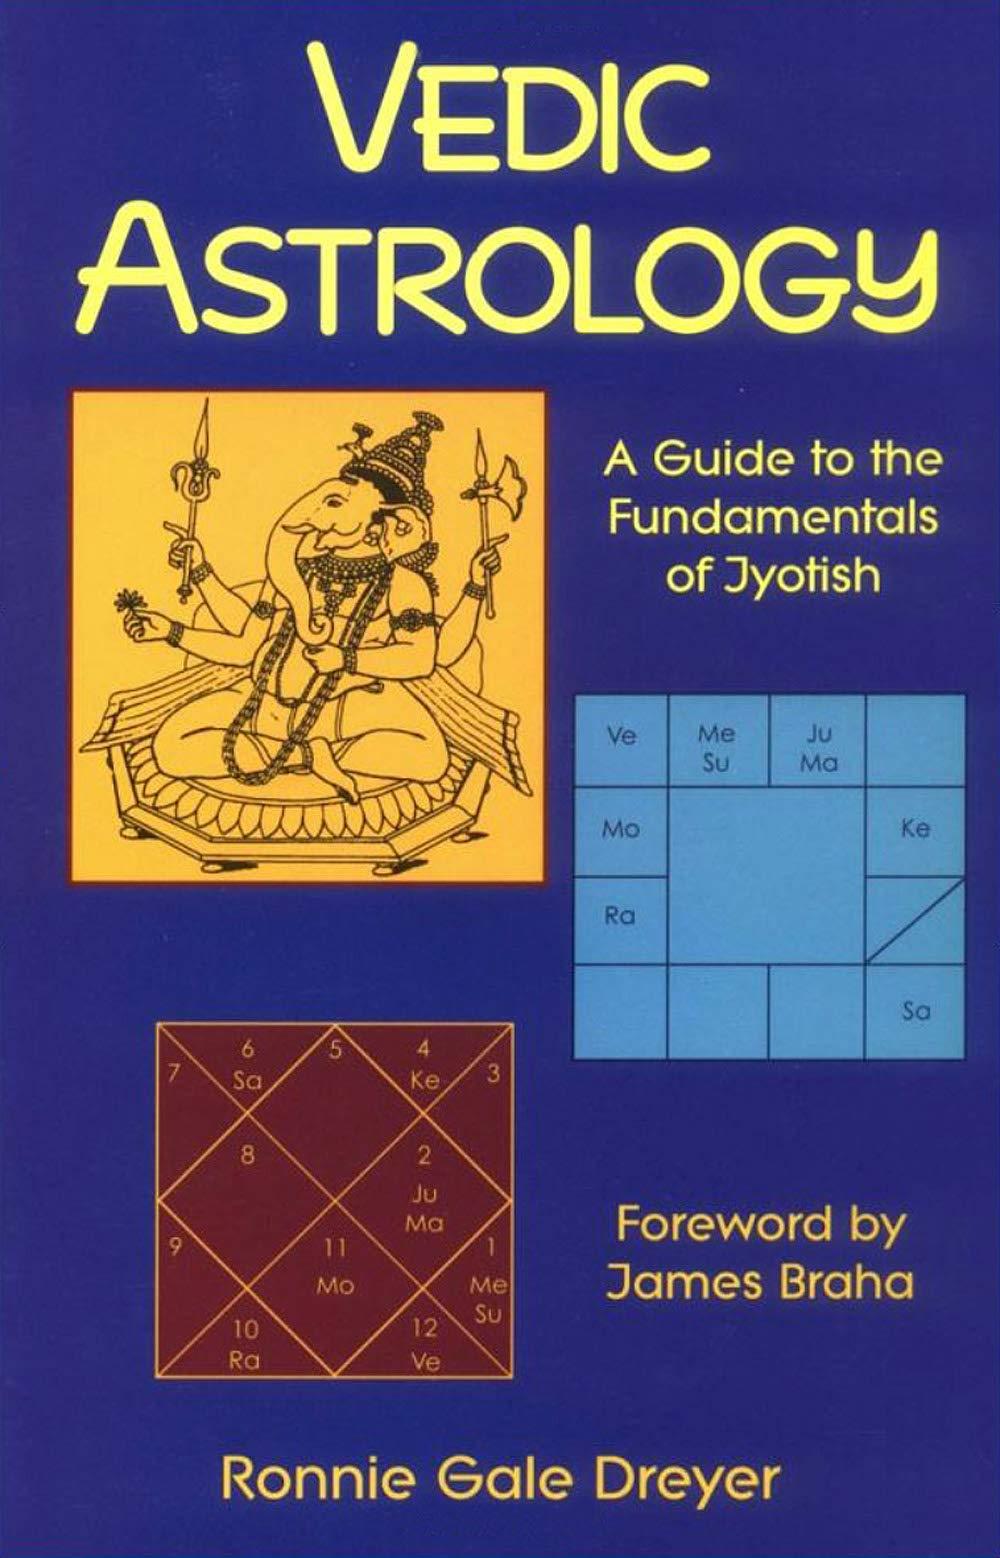 Vedic astrology free books